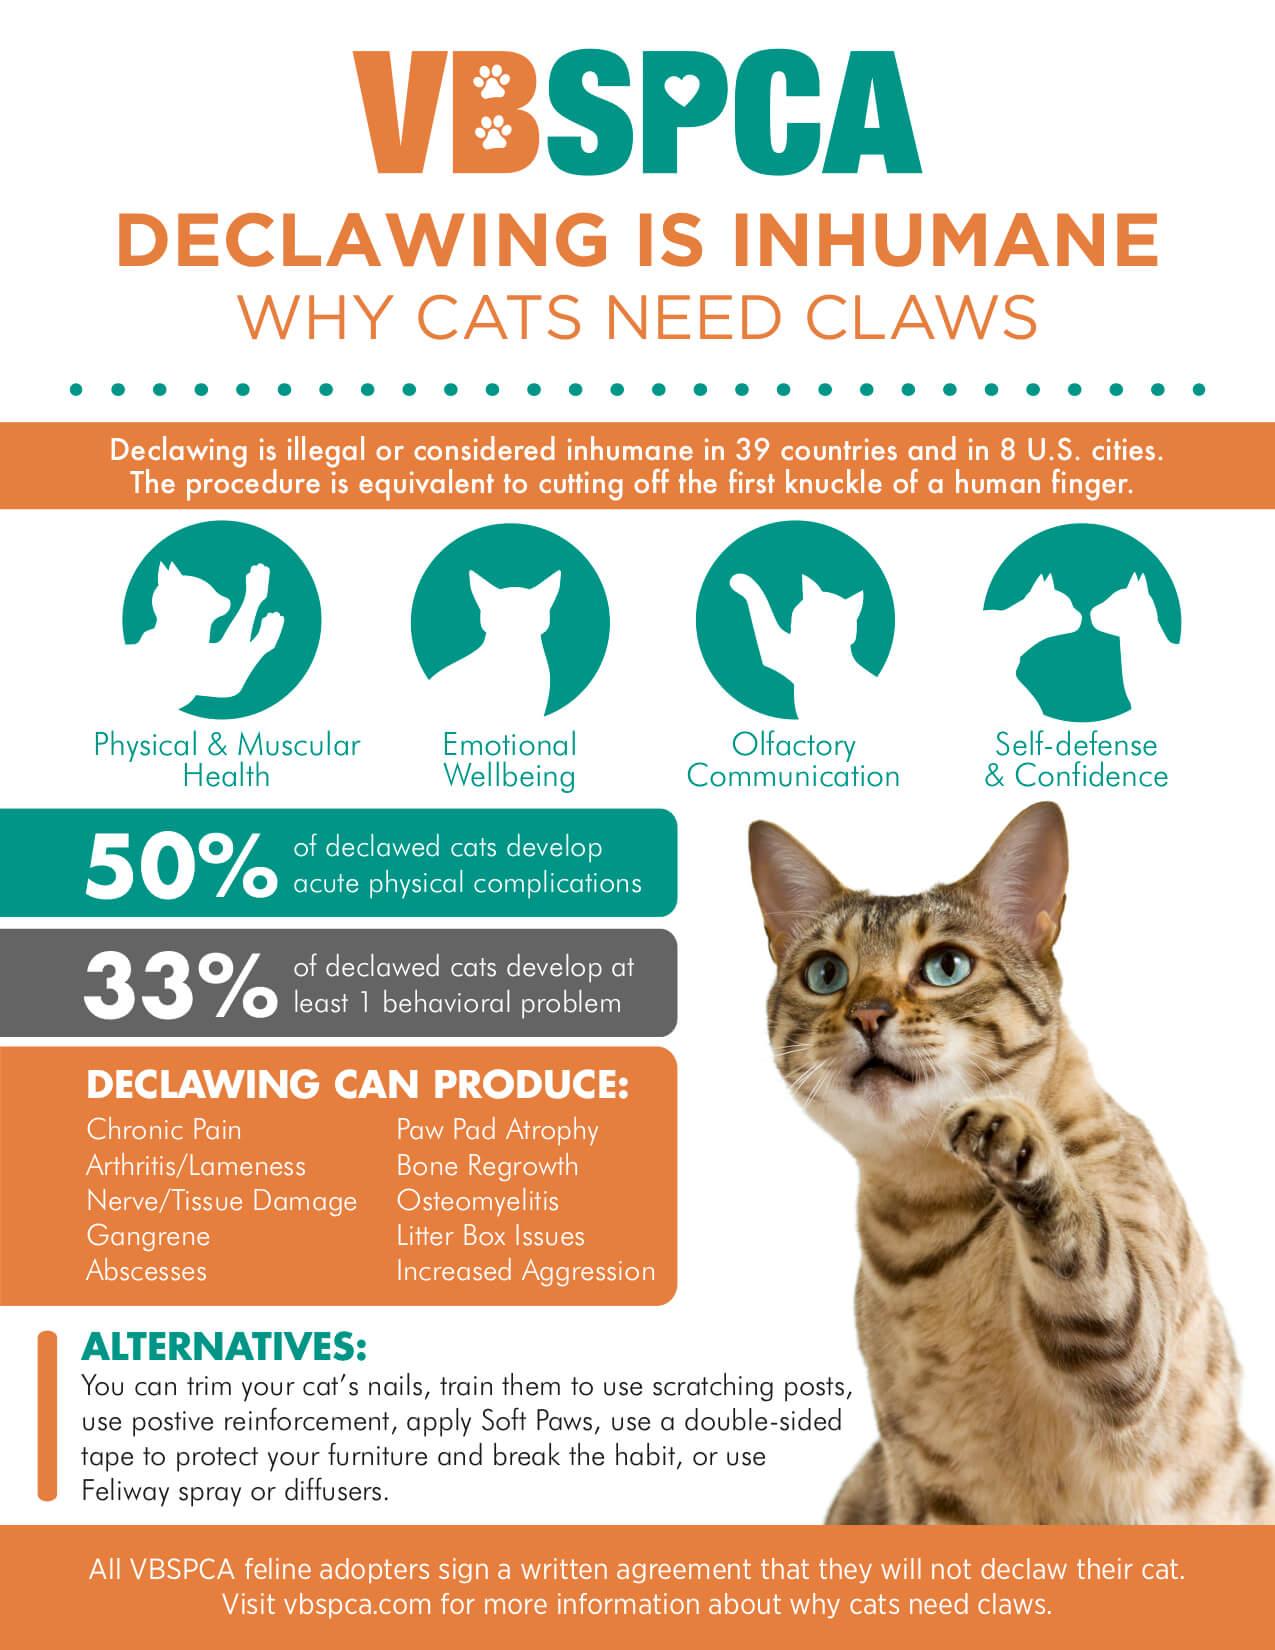 Cats Need Claws Virginia Beach Spca